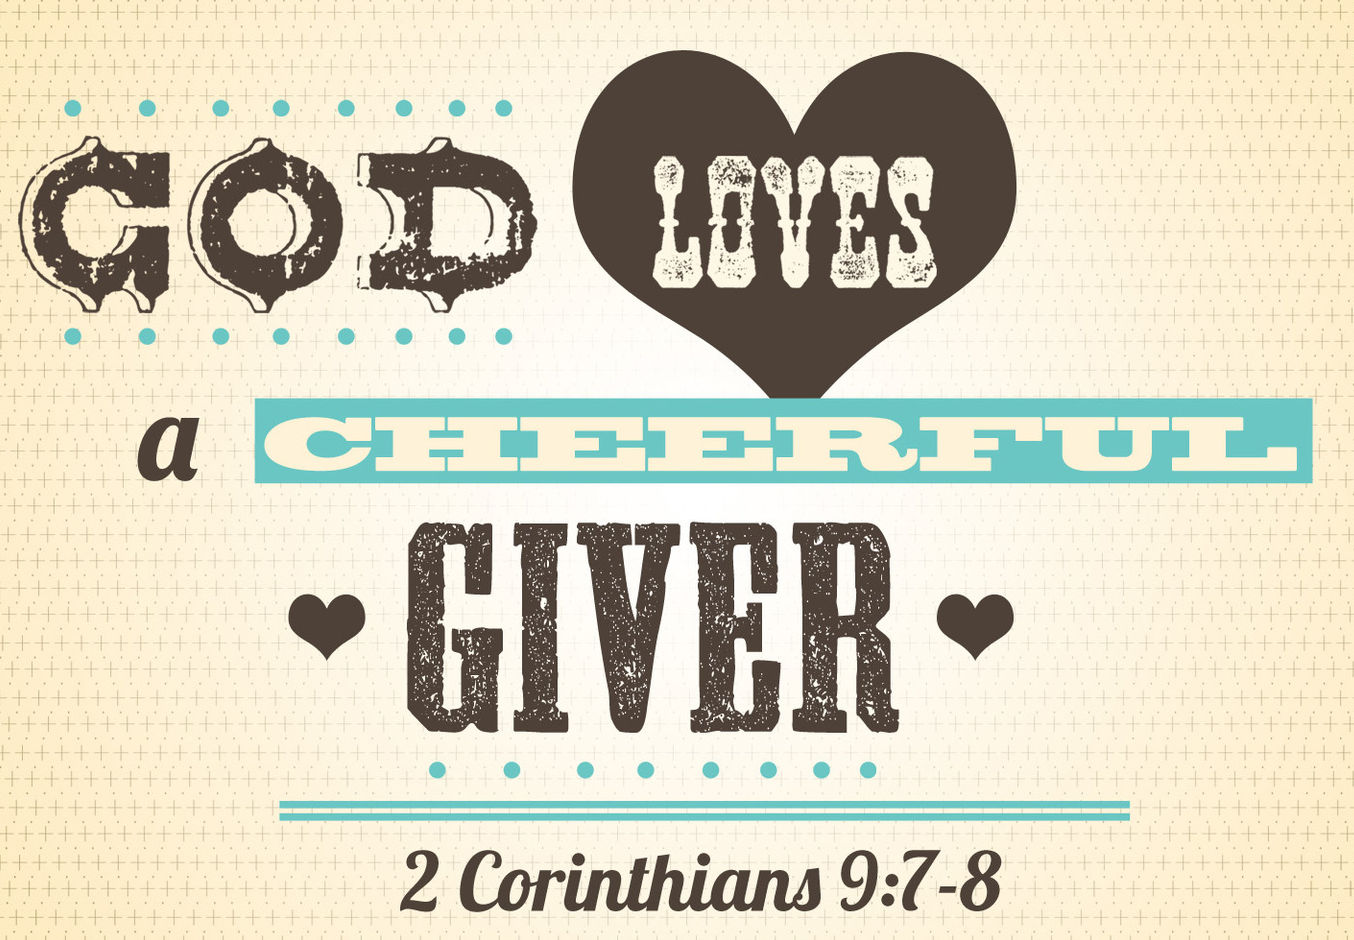 god_loves_a_cheerful_giver-title-1-still-4x3.jpg